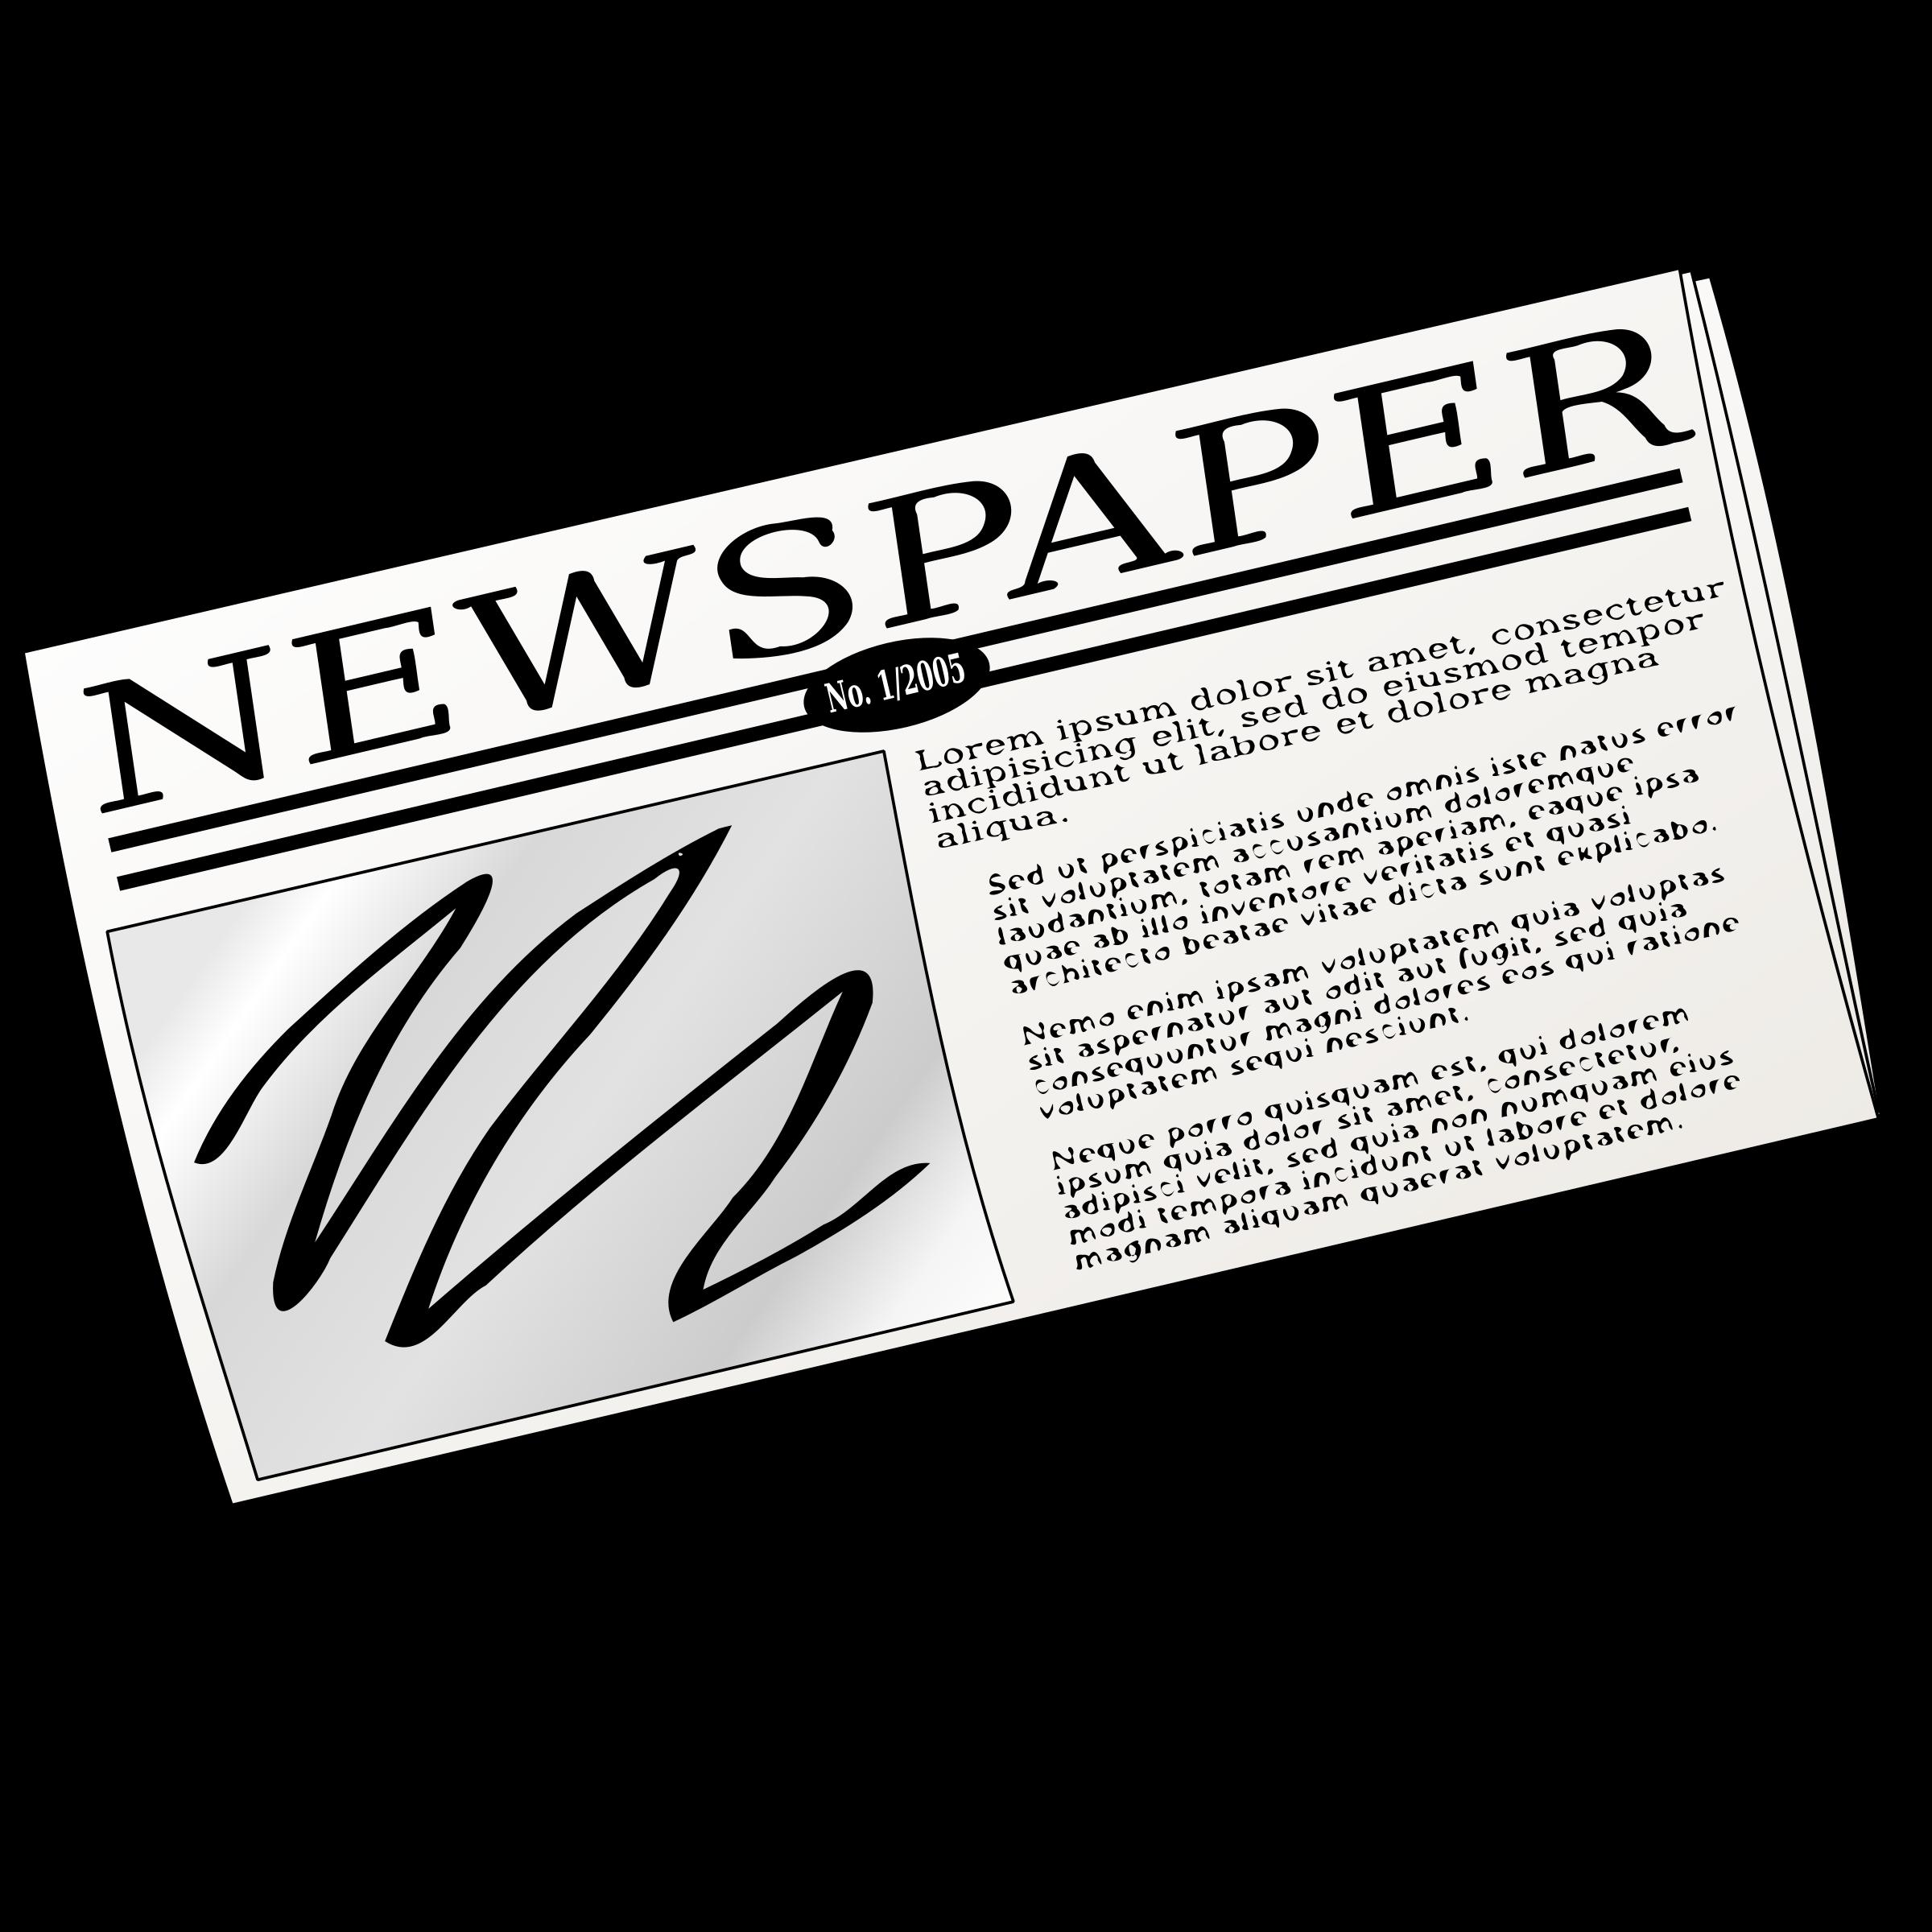 Of clip art me. Newsletter clipart newspaper advertising